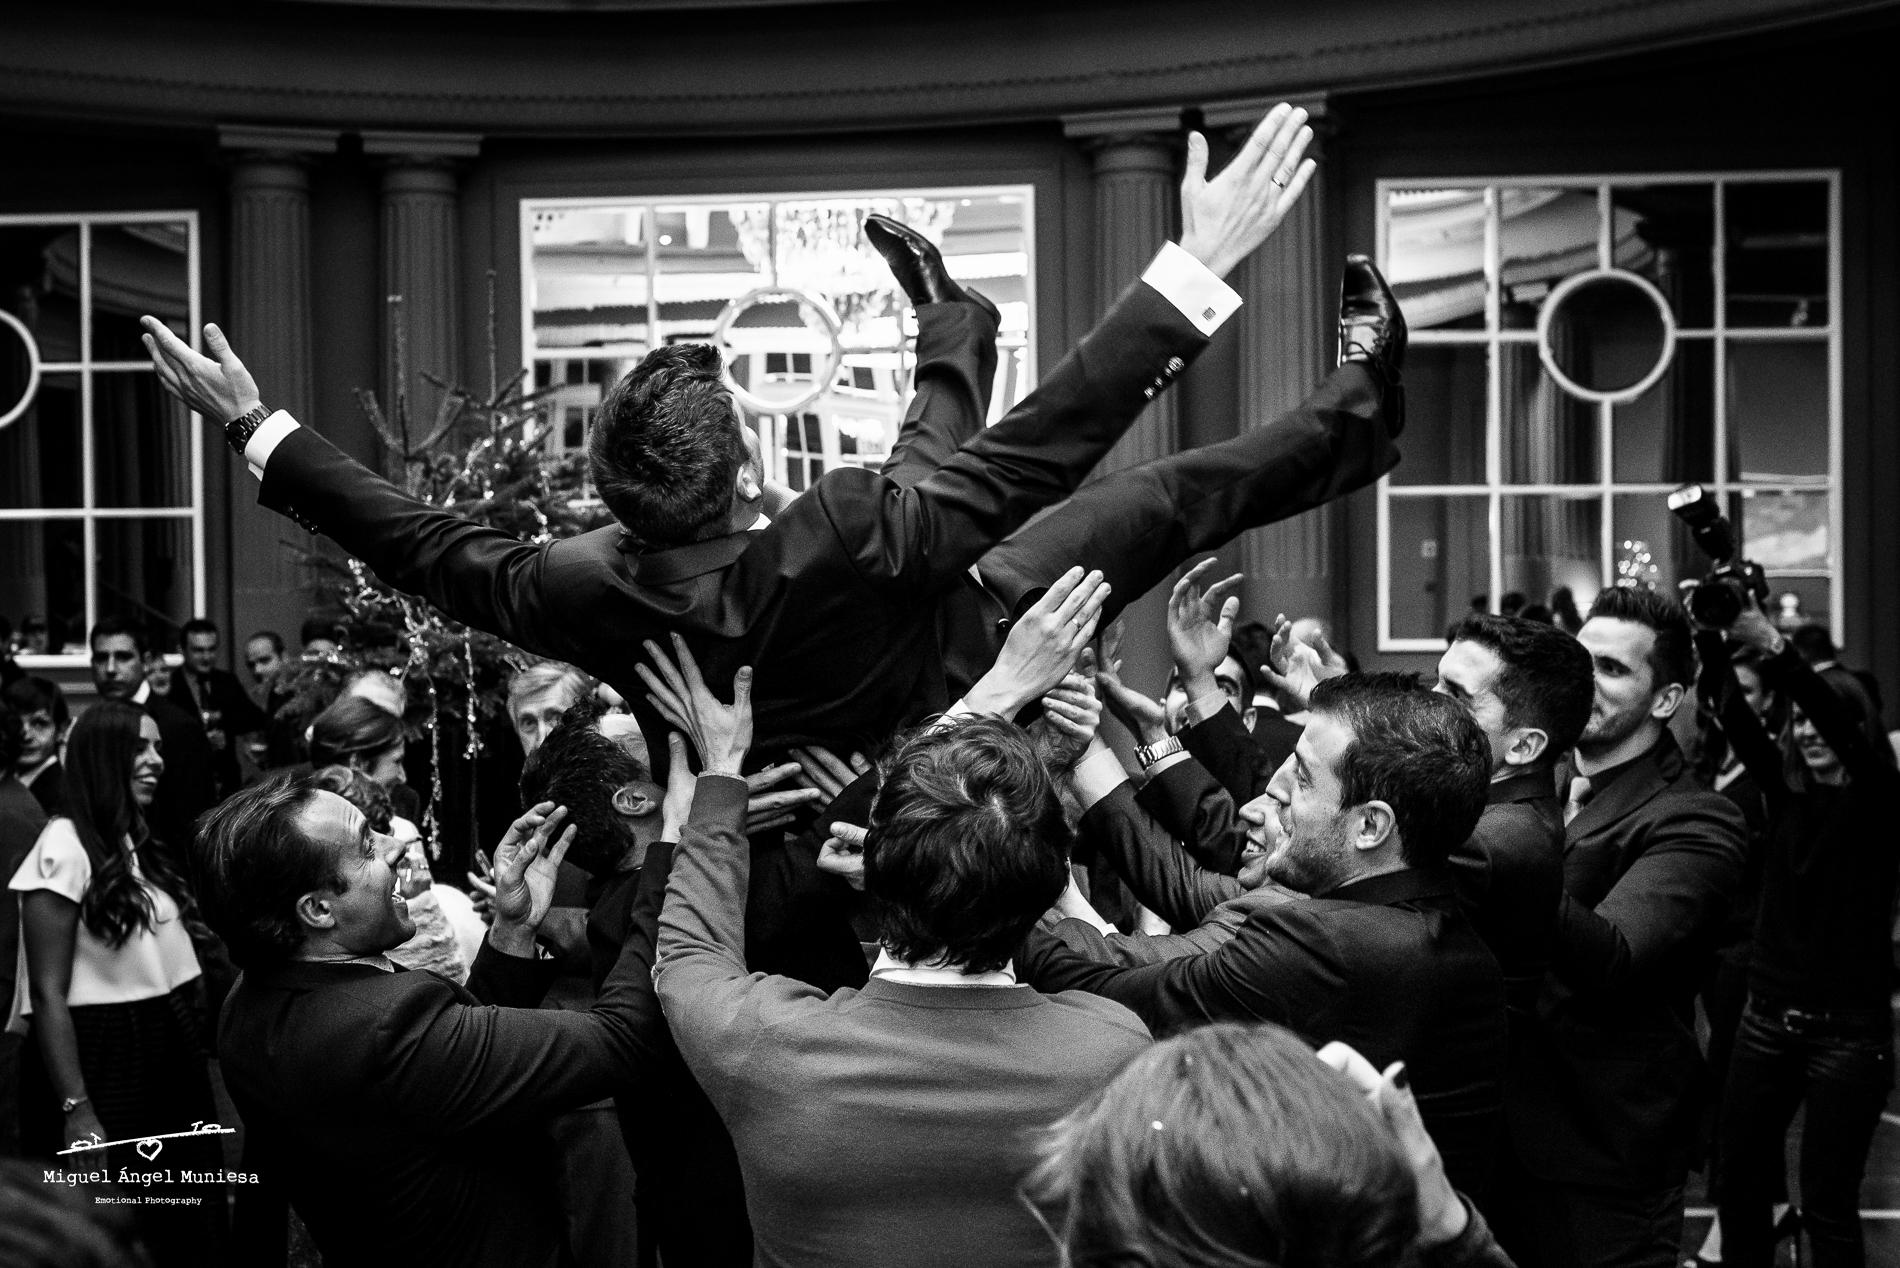 miguel angel muniesa, fotografo boda Teruel, fotografo boda navarra, fotografo boda zaragoza, fotografo boda soria, miguel angel muniesa emotional photography_20